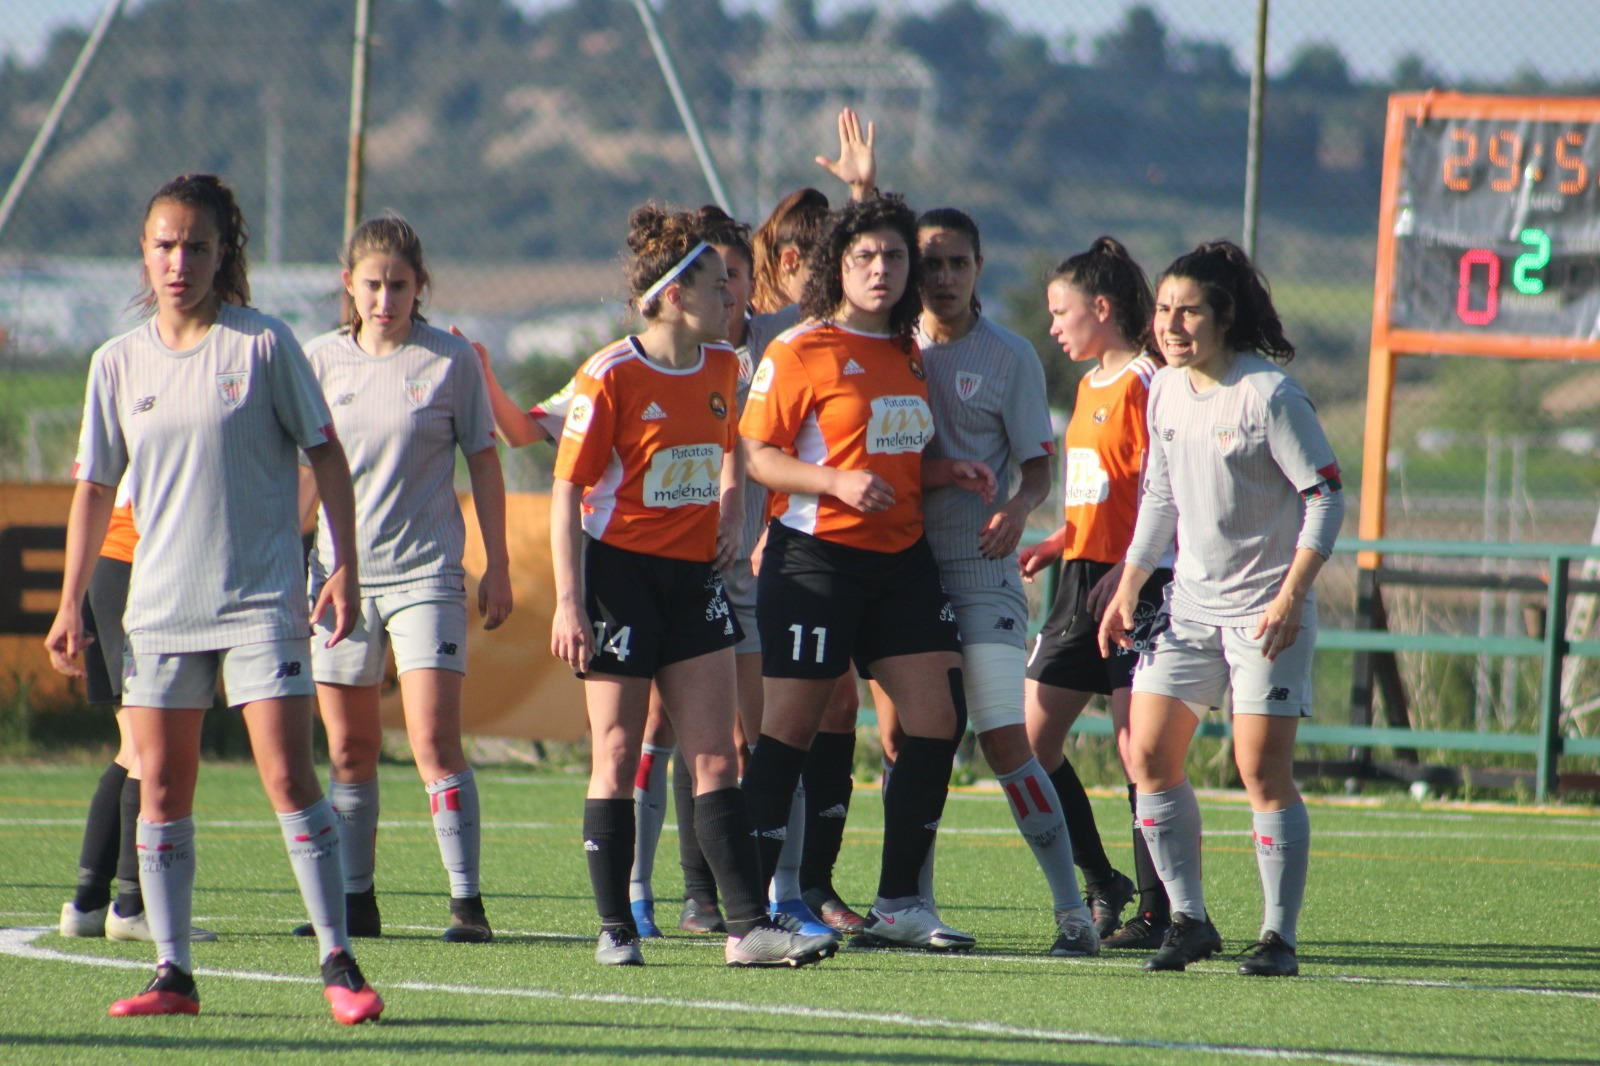 sdsA por la tercera victoria consecutiva del CD Parquesol Patatas Meléndez